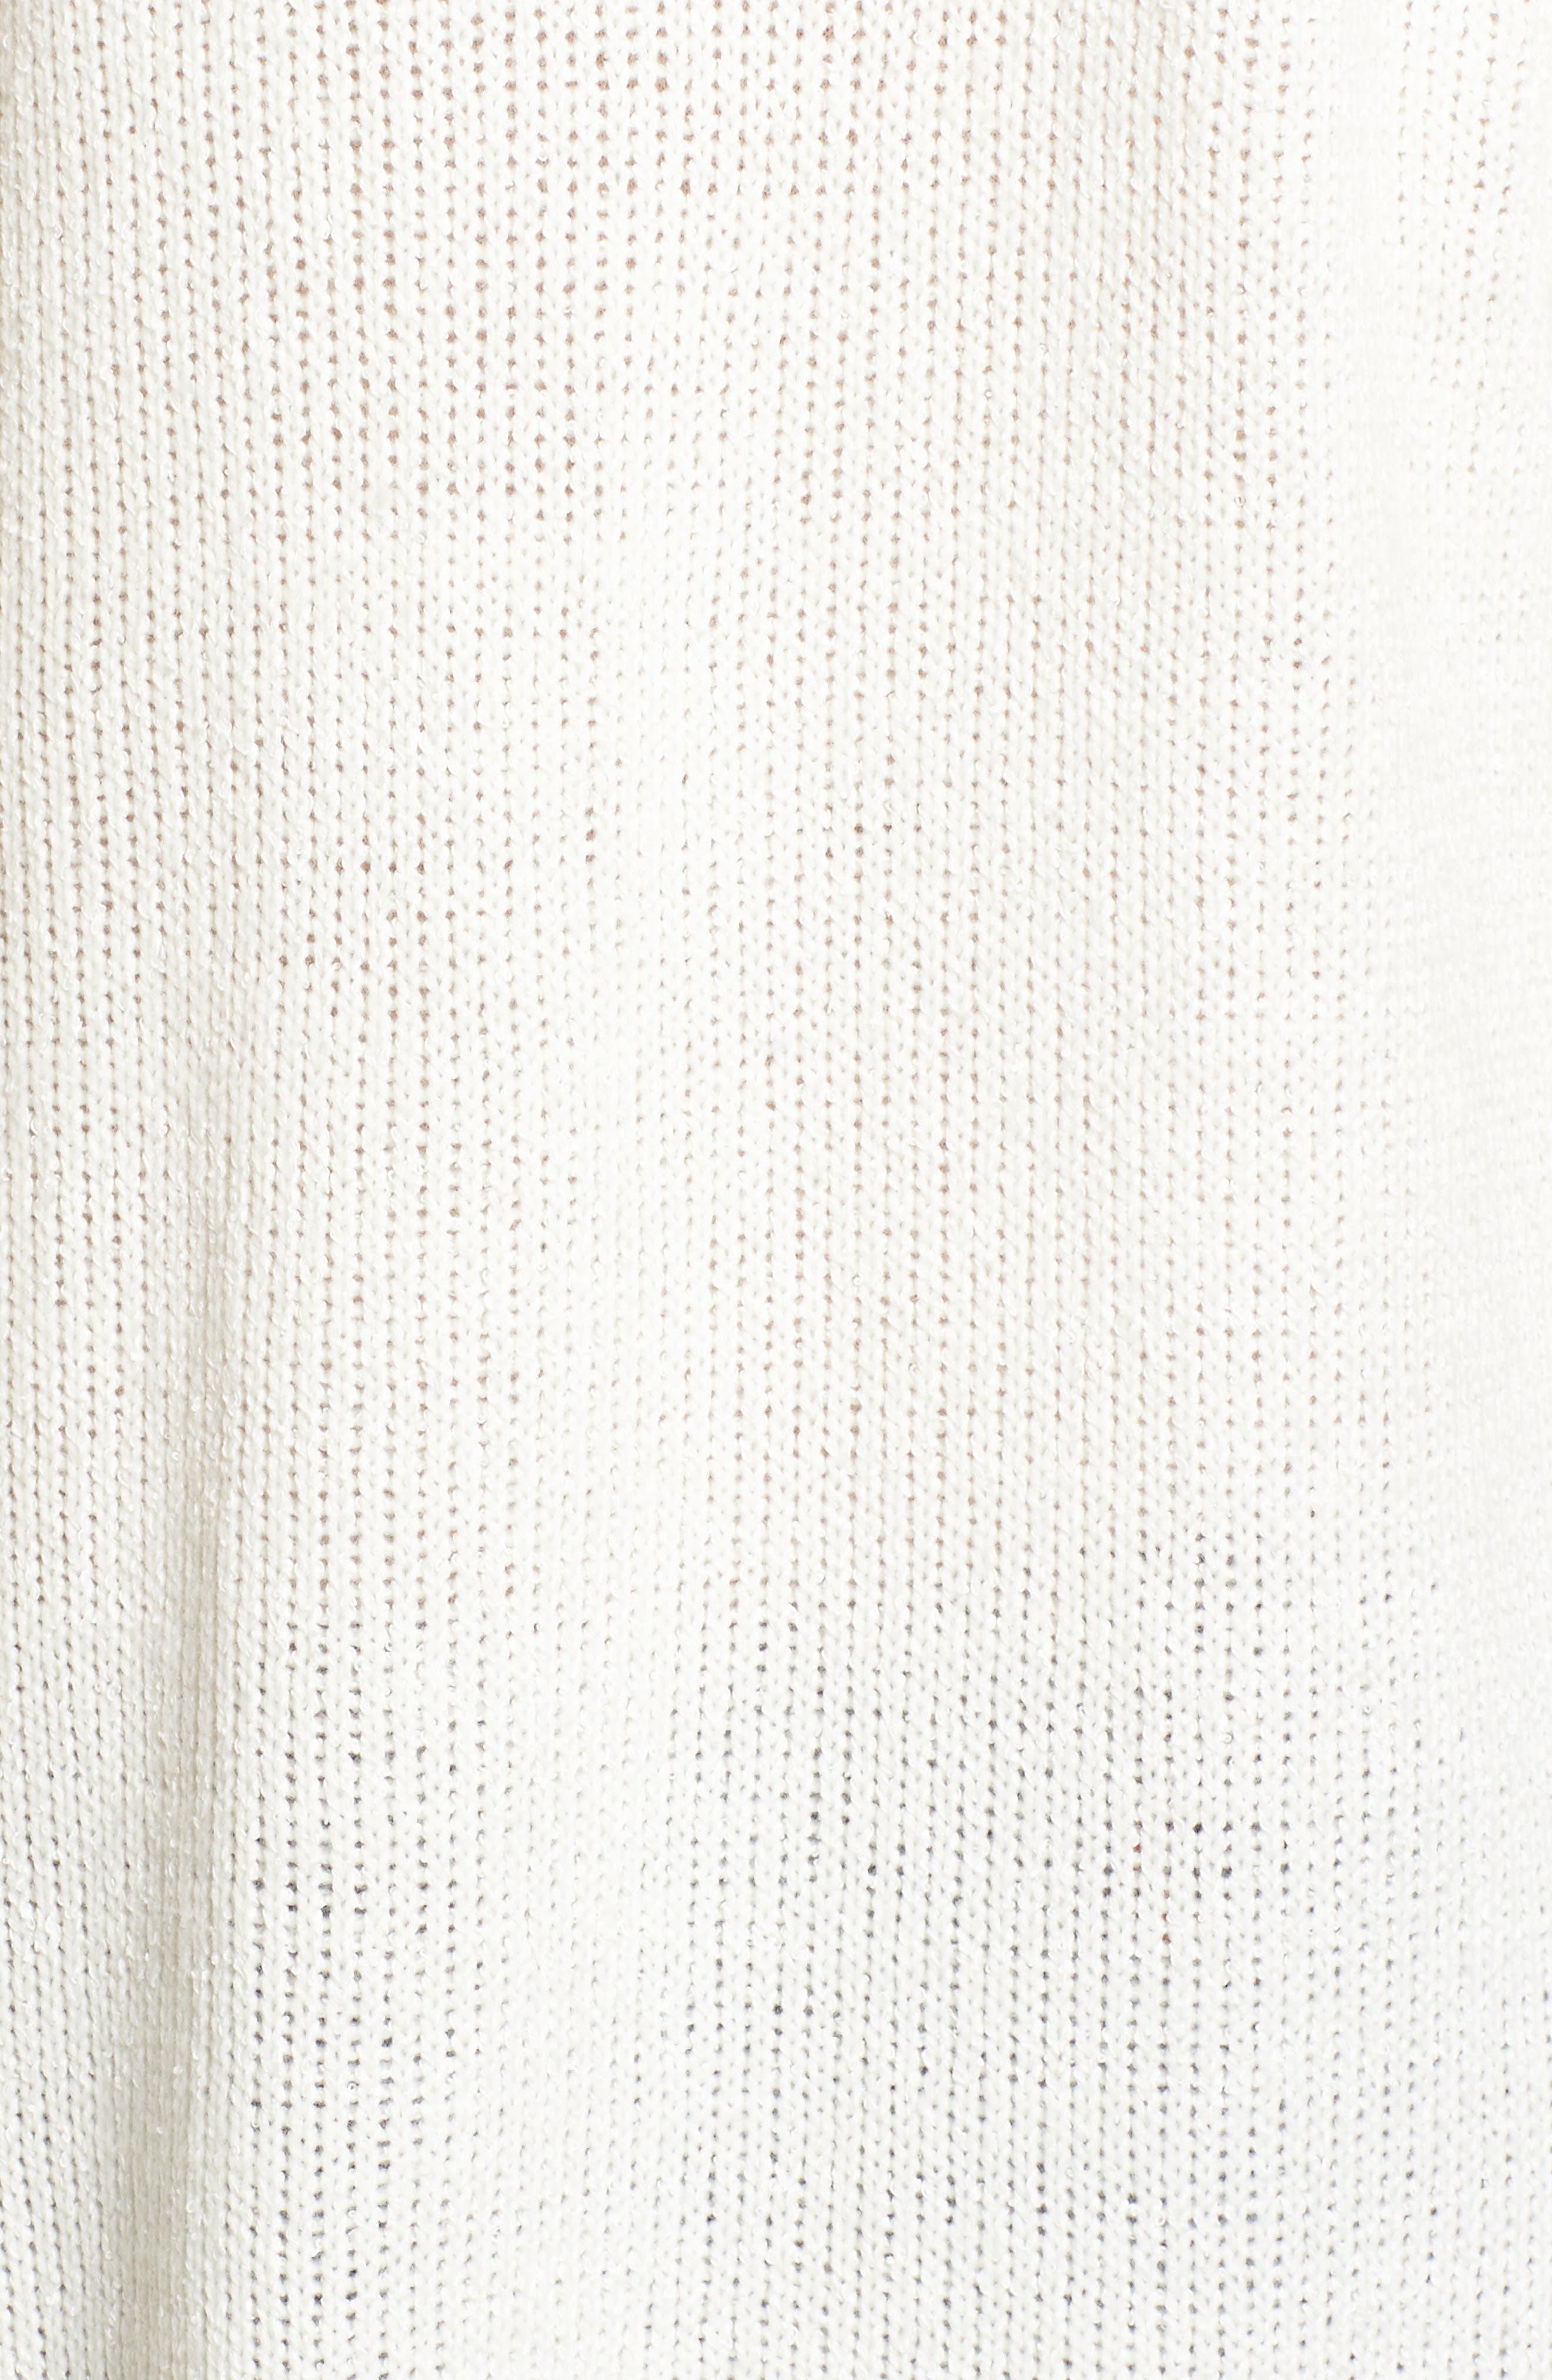 Blanco Open Cardigan,                             Alternate thumbnail 6, color,                             White